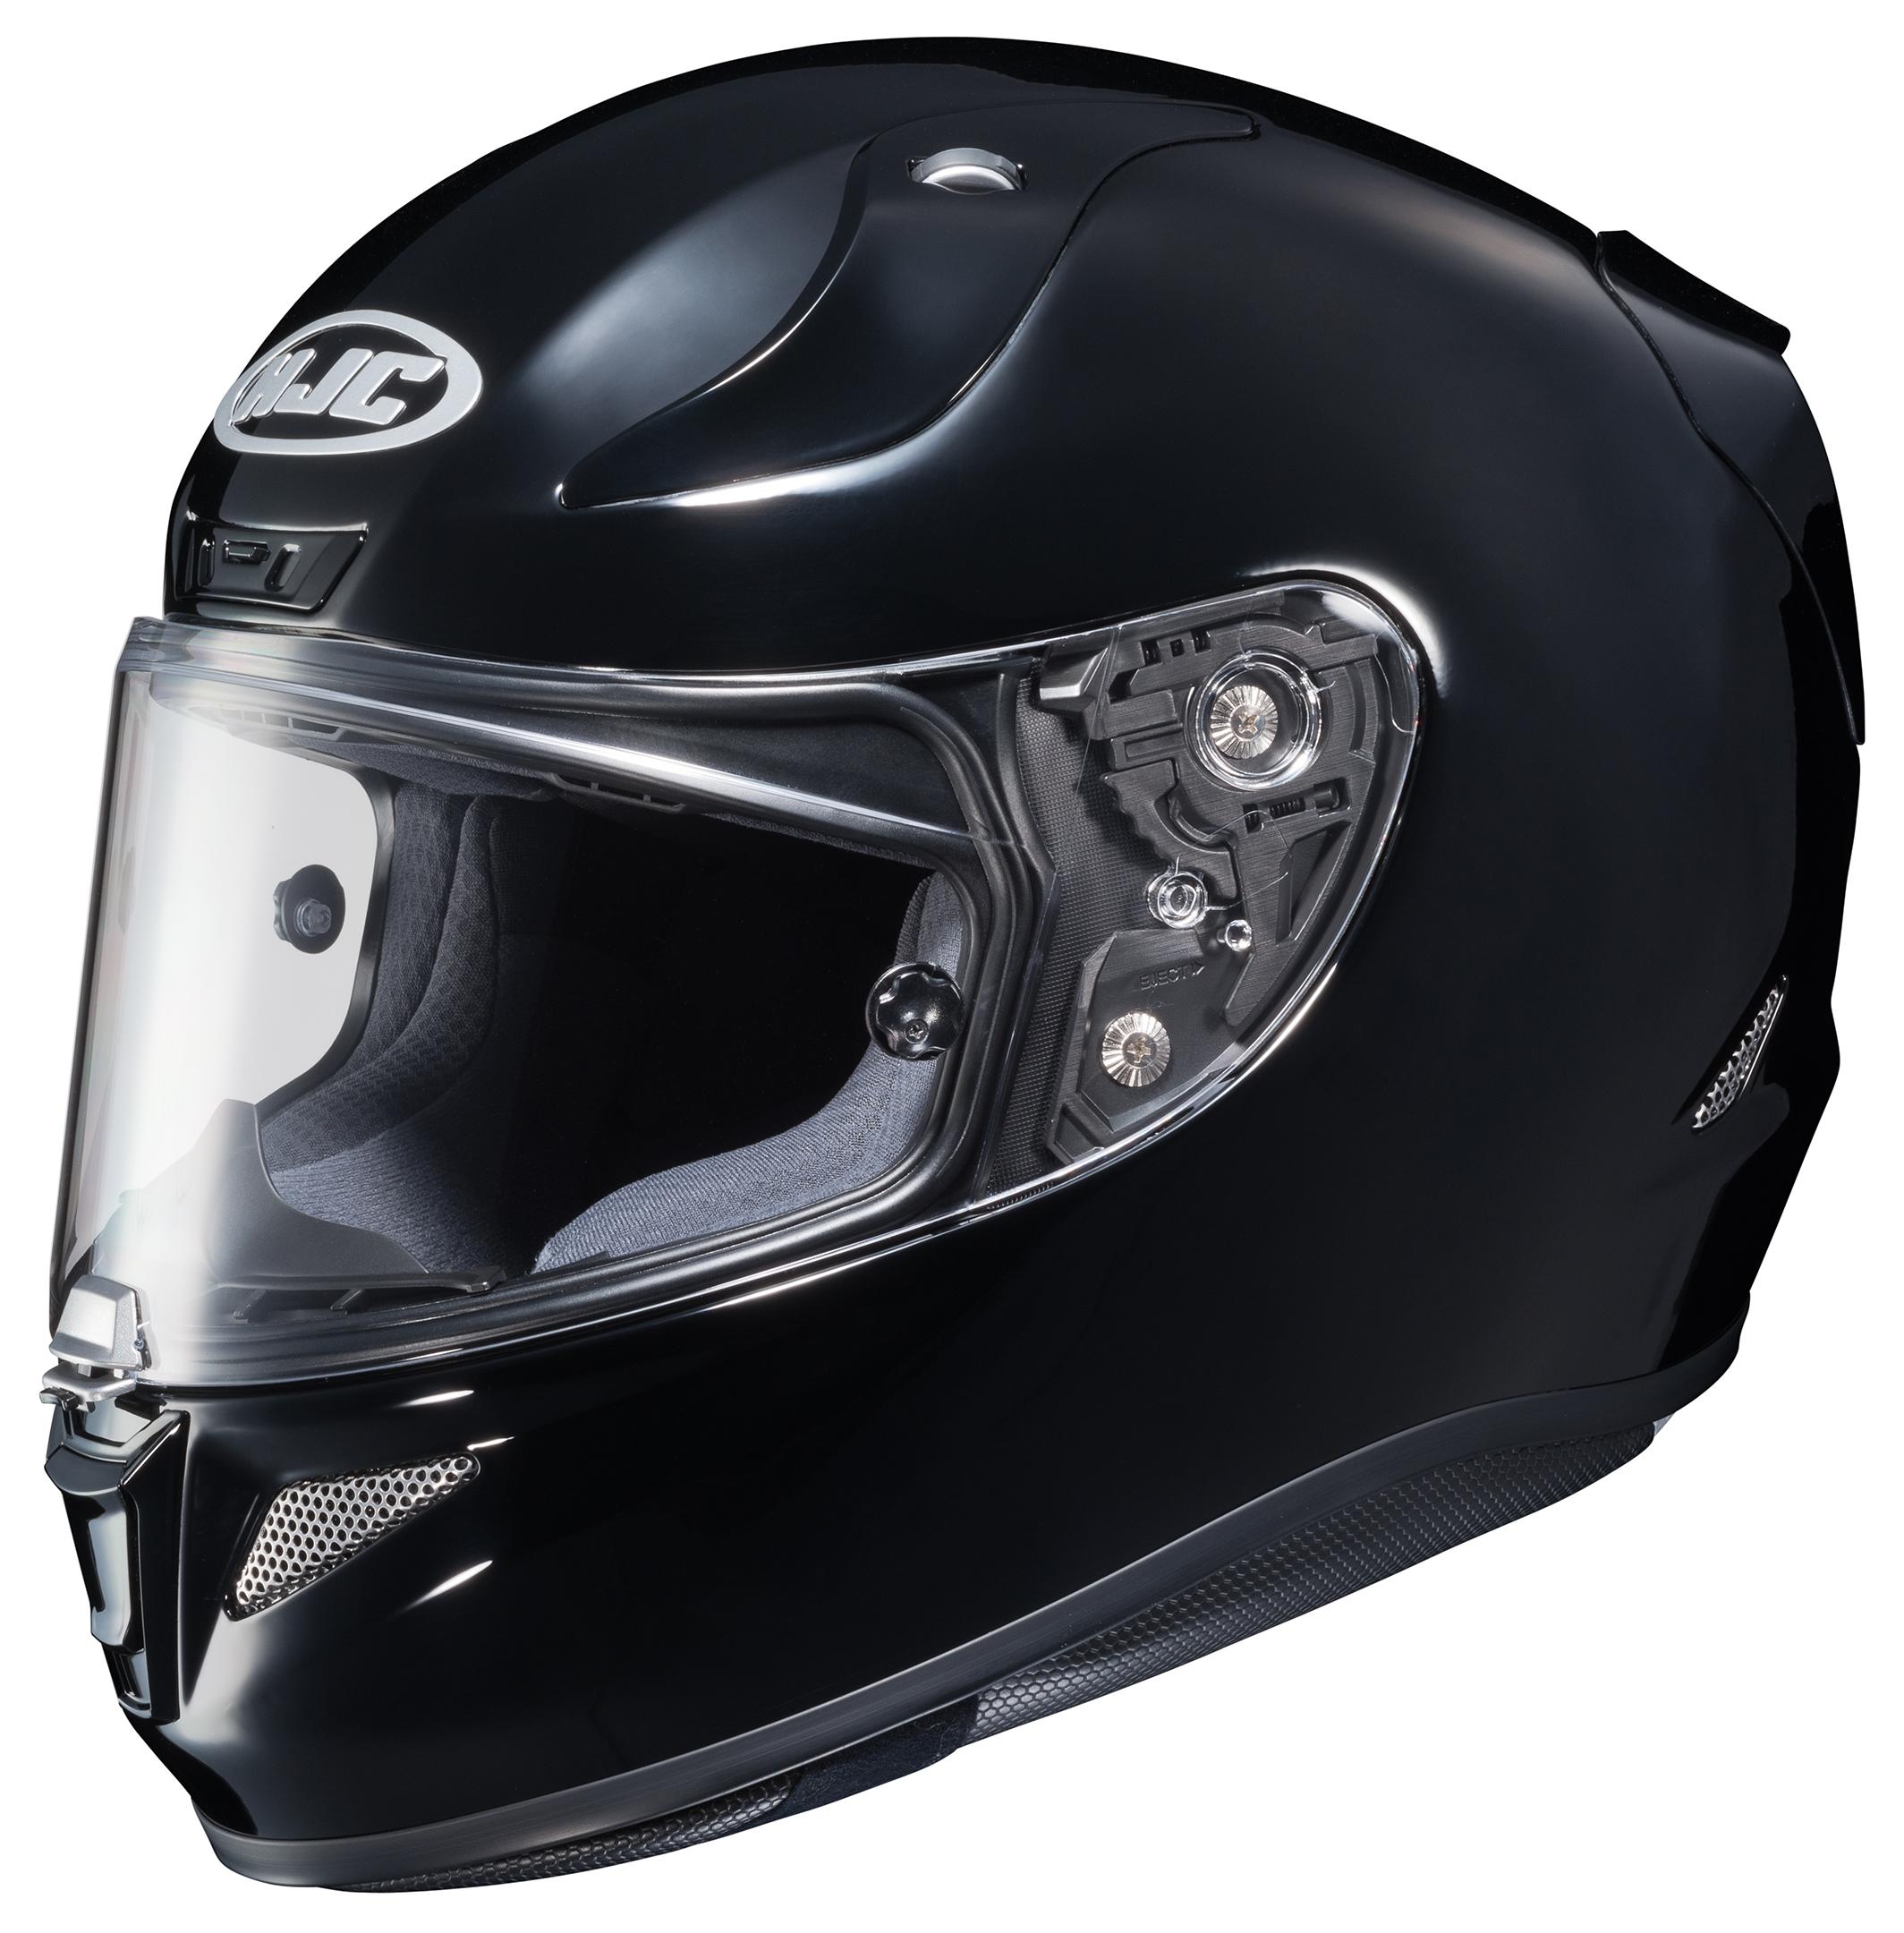 Hjc Rpha 11 >> Hjc Rpha 11 Pro Helmet 10 41 50 Off Revzilla